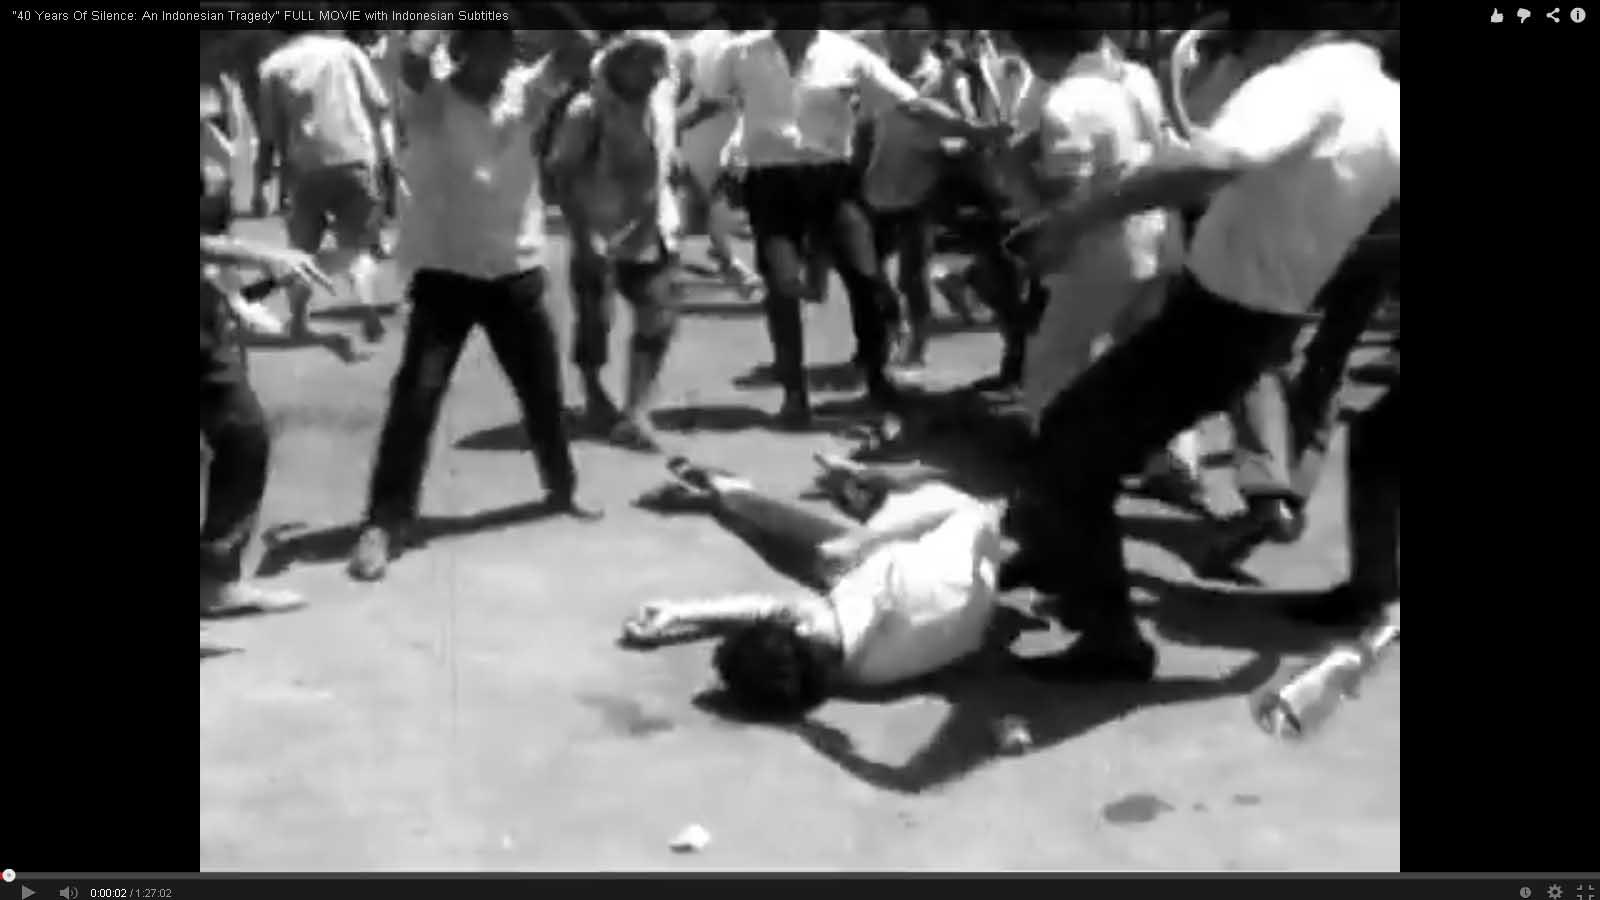 Film 40 Years of Silence: Suara korban pembantaian 65 - 66